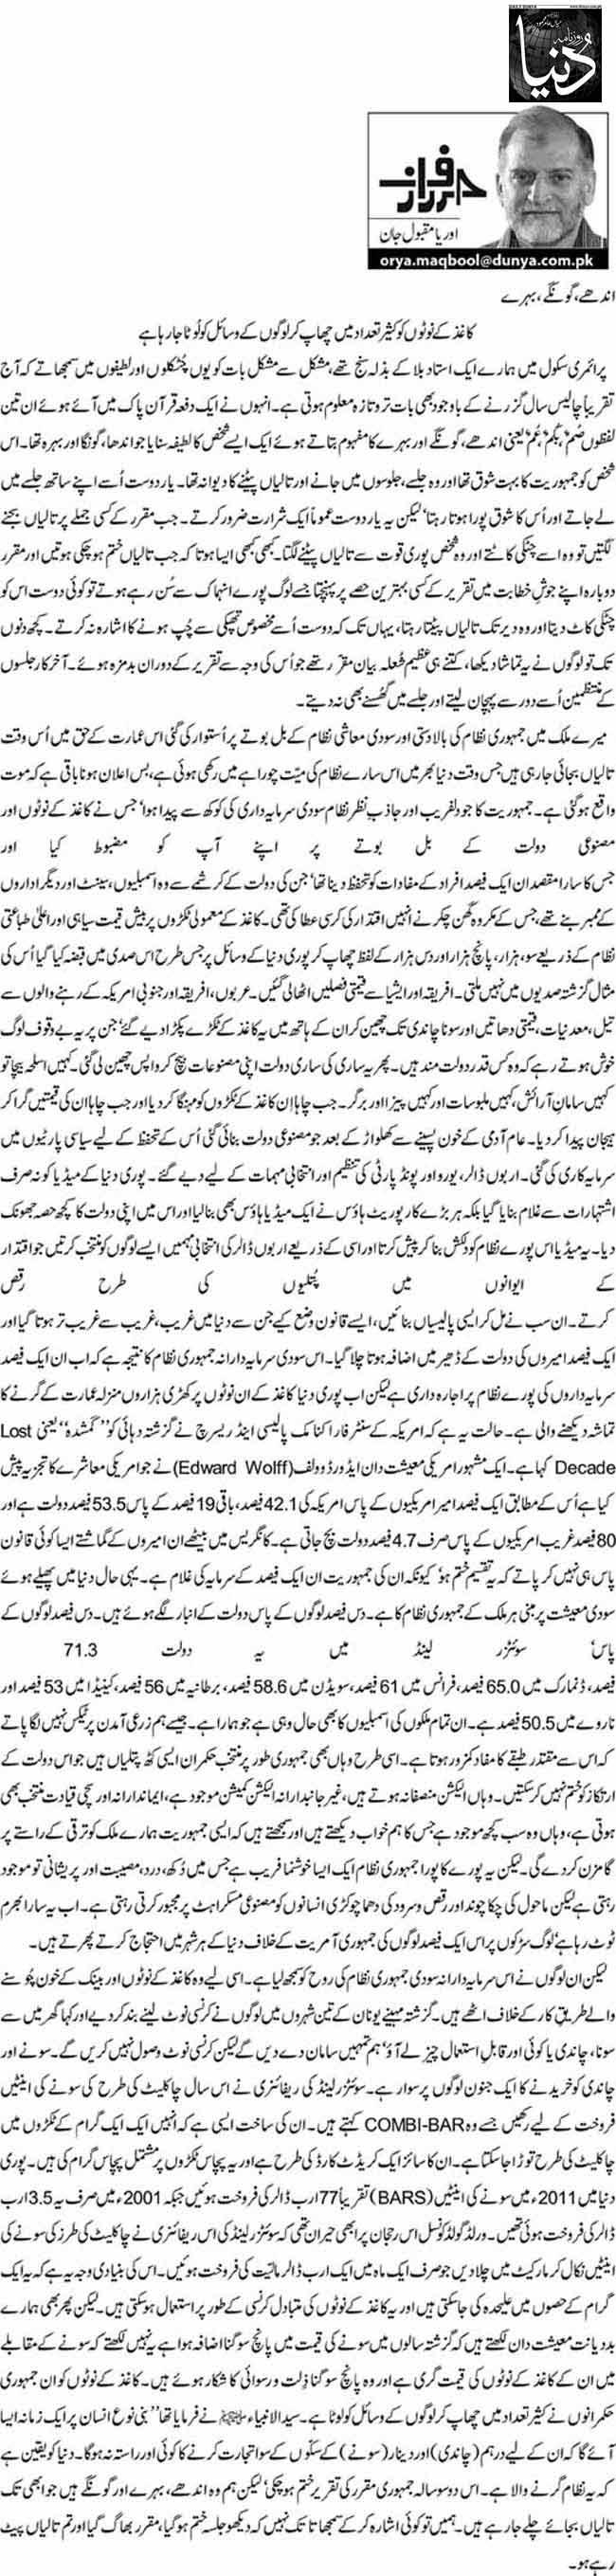 Andhay, Goongay, Behray - Orya Maqbool Jan